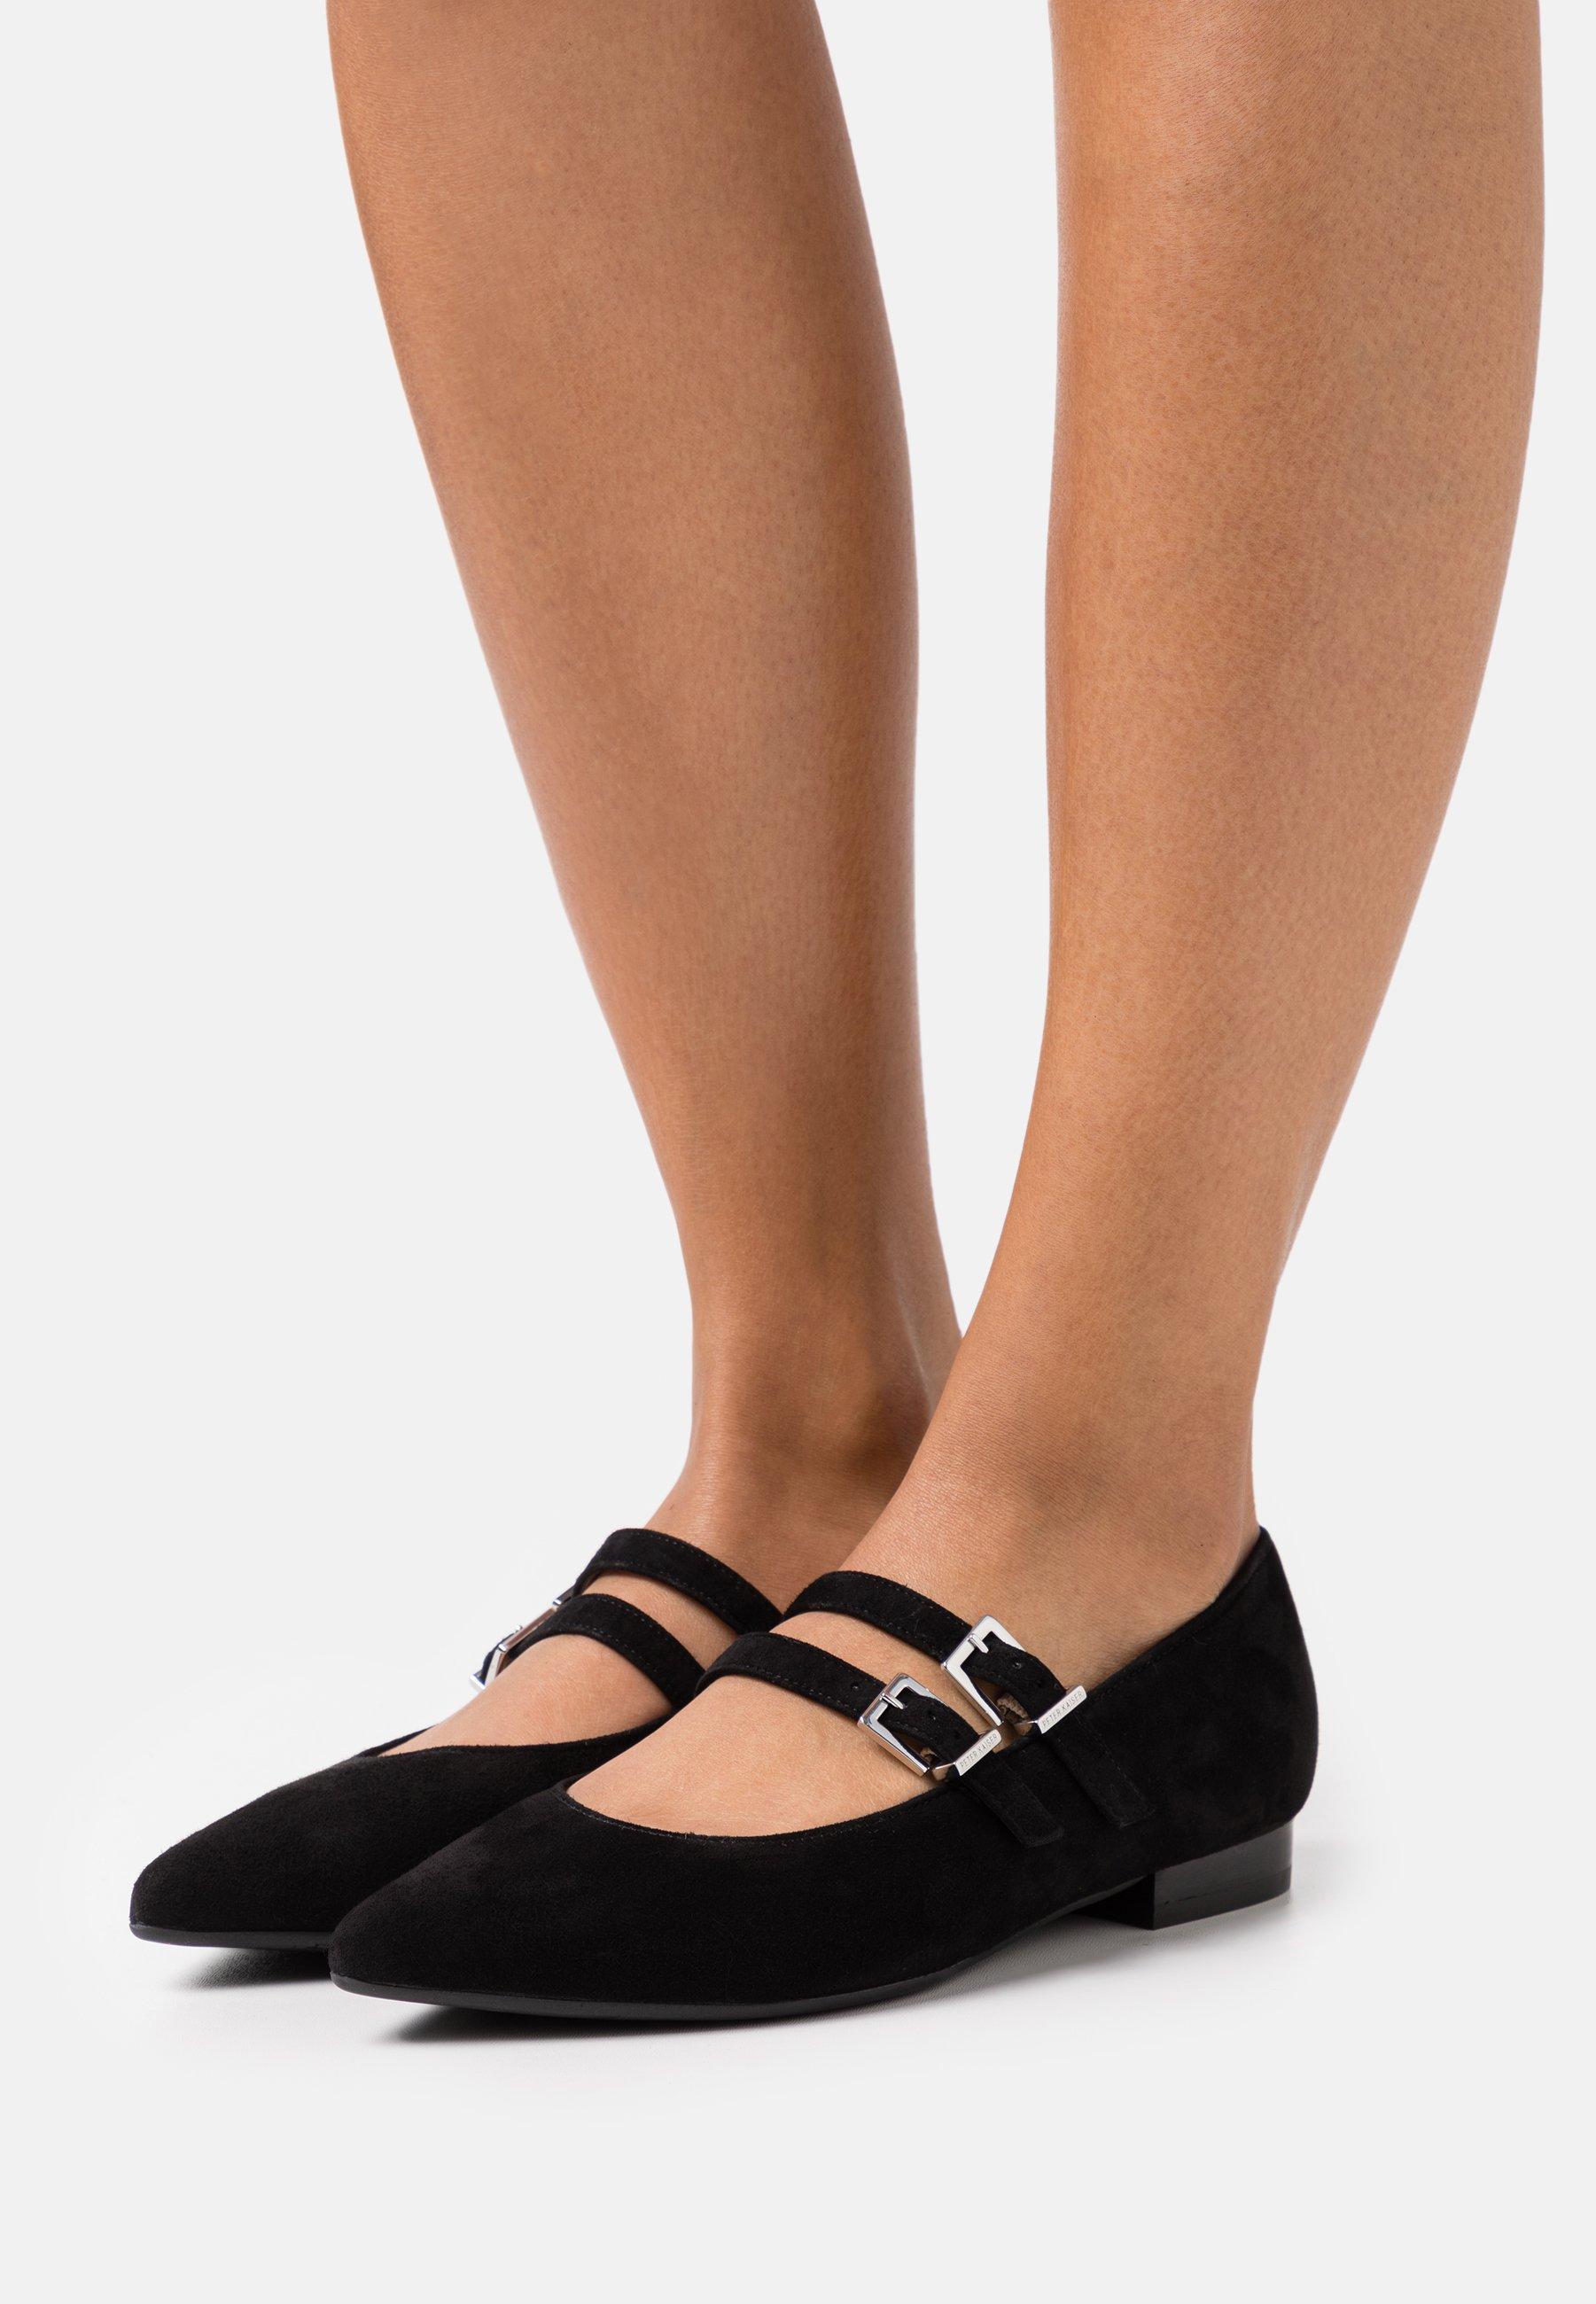 Women TACOMA - Ankle strap ballet pumps - schwarz